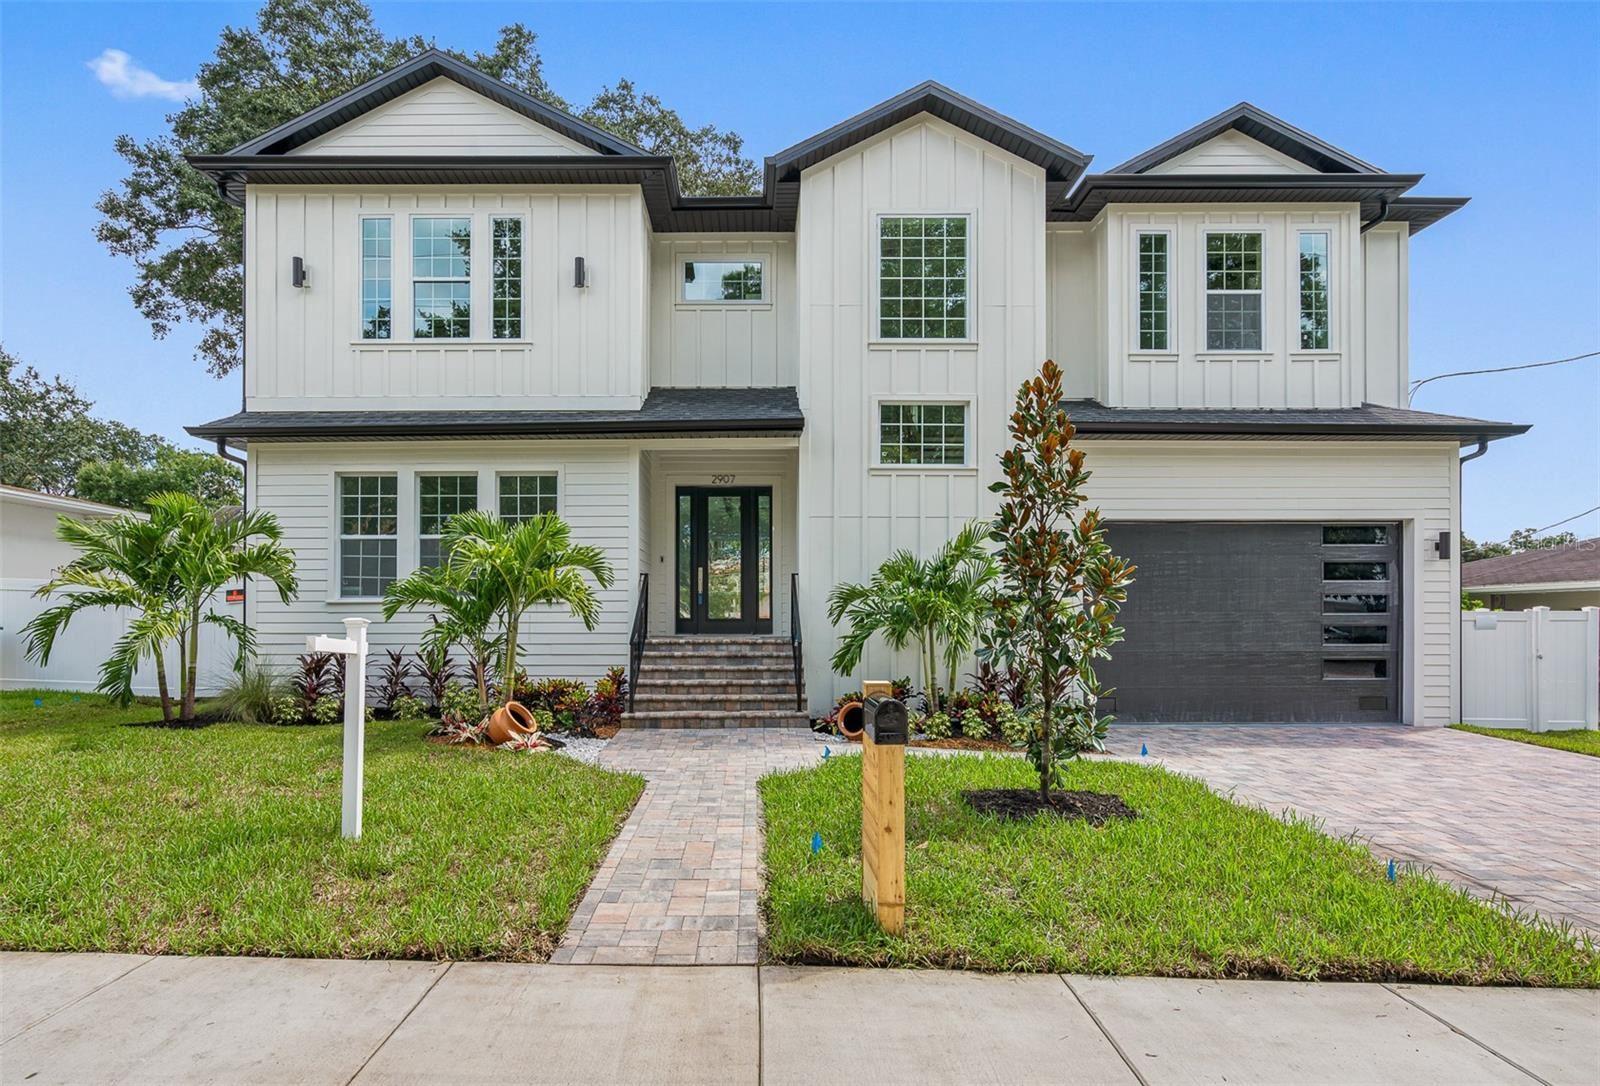 2907 N PERRY AVENUE, Tampa, FL 33602 - #: T3320215